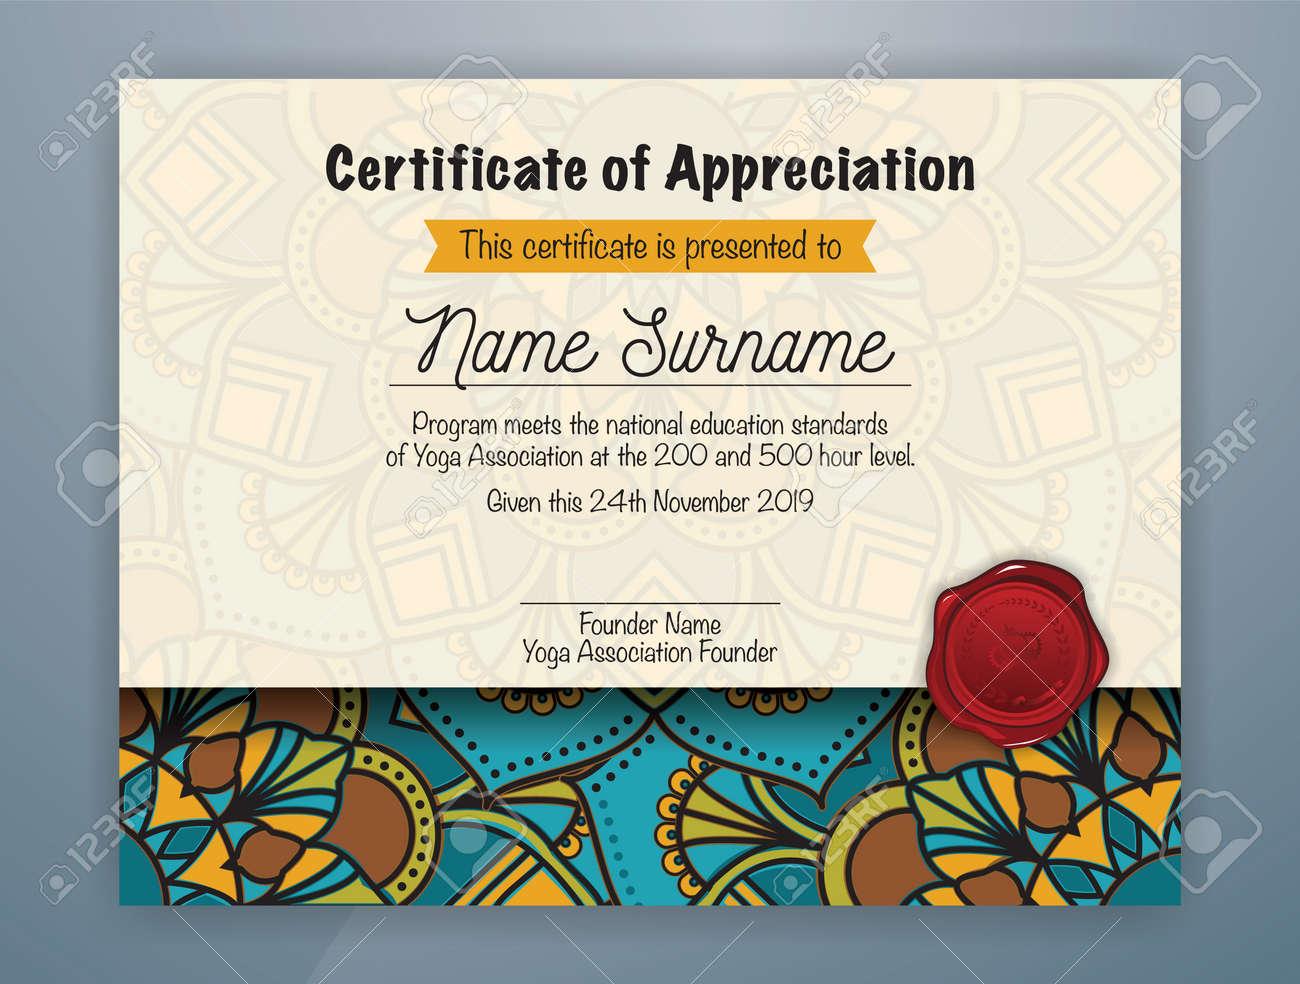 Mandala bordered certificate of appreciation template design mandala bordered certificate of appreciation template design for yoga class vector illustration stock vector m4hsunfo